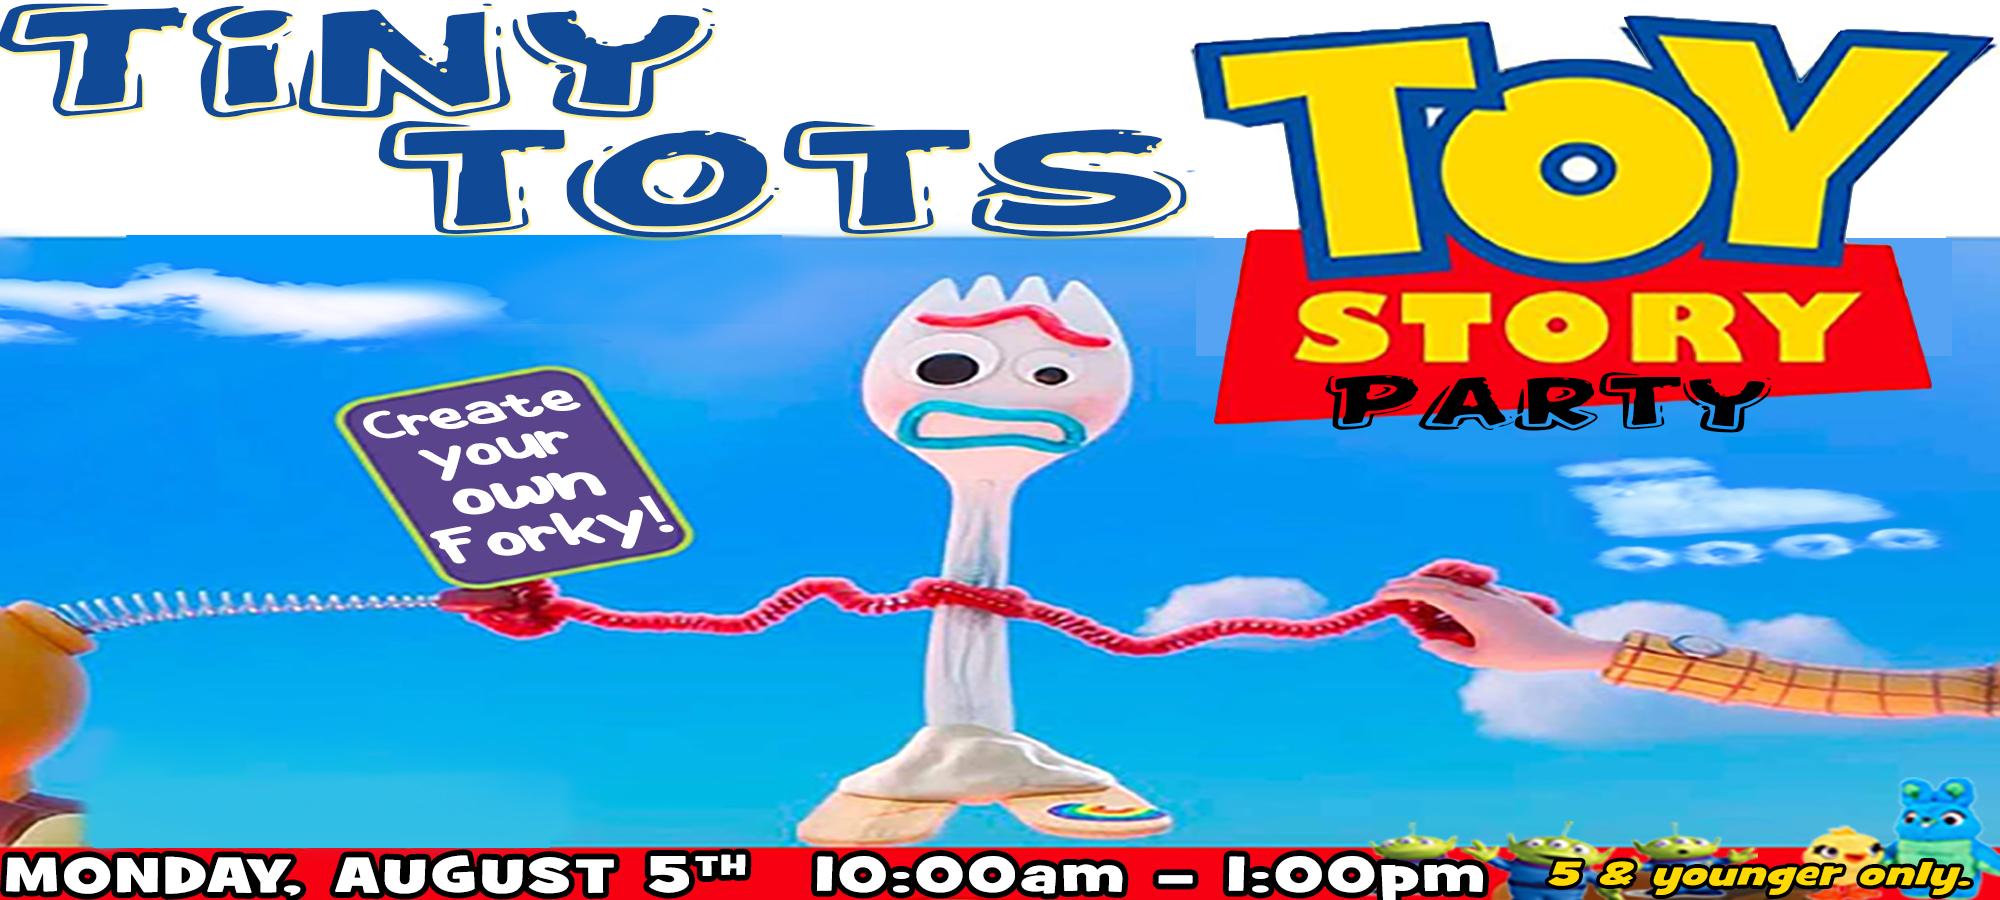 TT TS Party August 2019